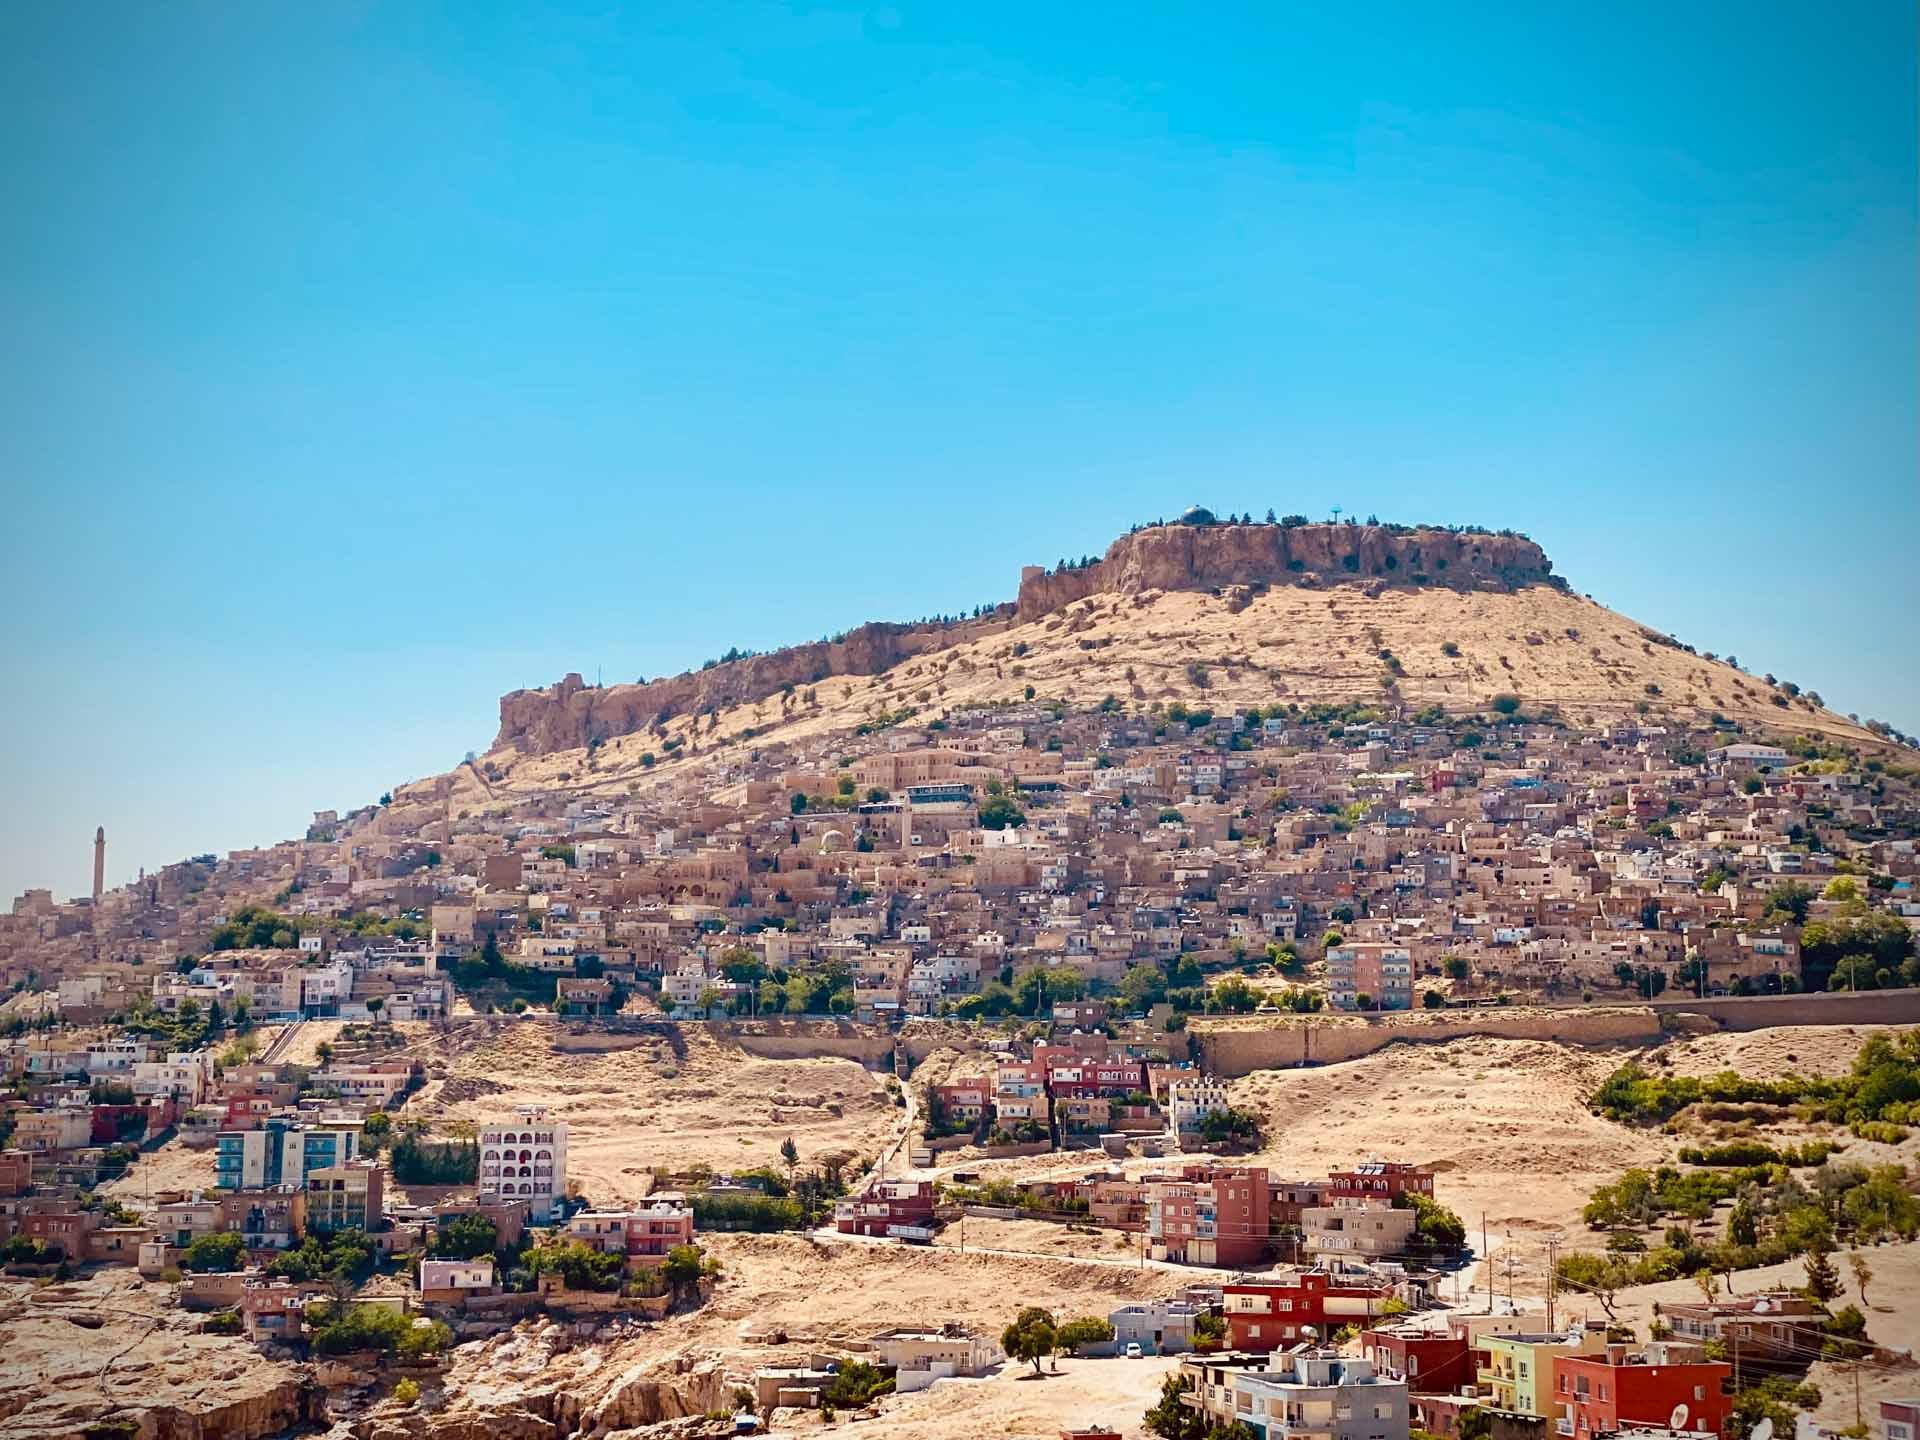 La ville de Mardin et sa citadelle © Emmanuel Laveran